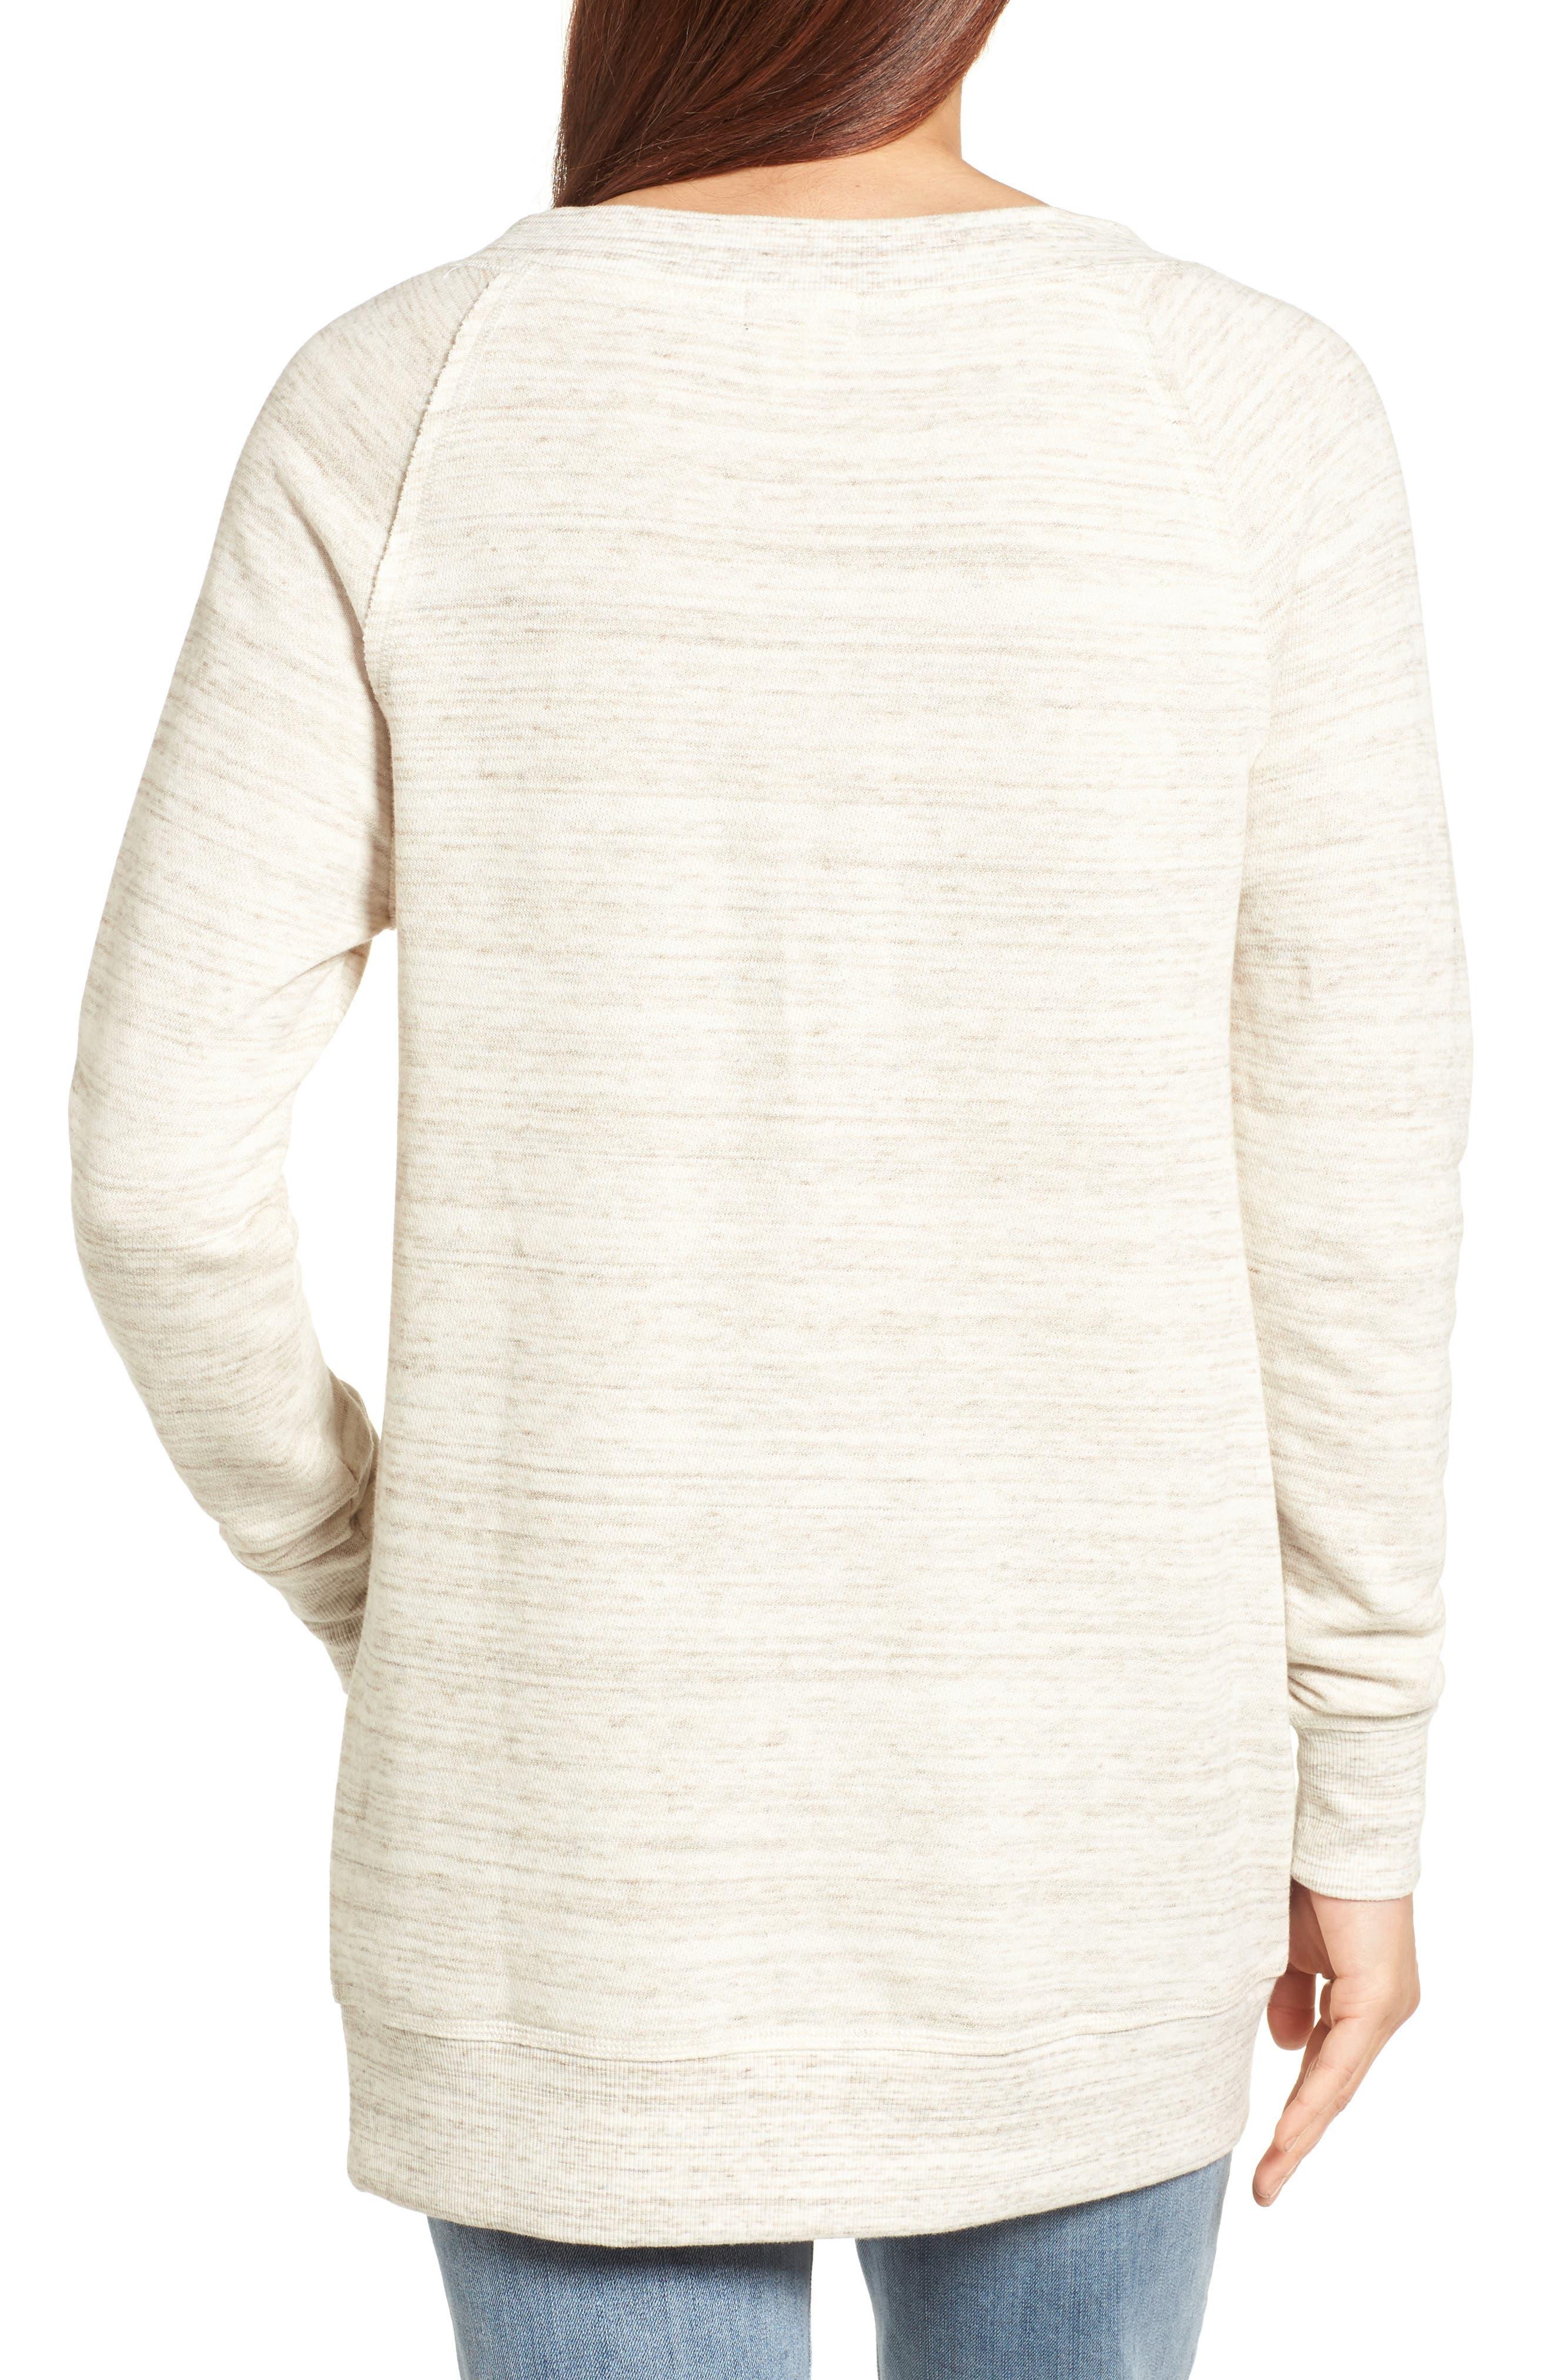 Alternate Image 2  - Caslon® Space Dye Tunic Sweatshirt (Regular & Petite)